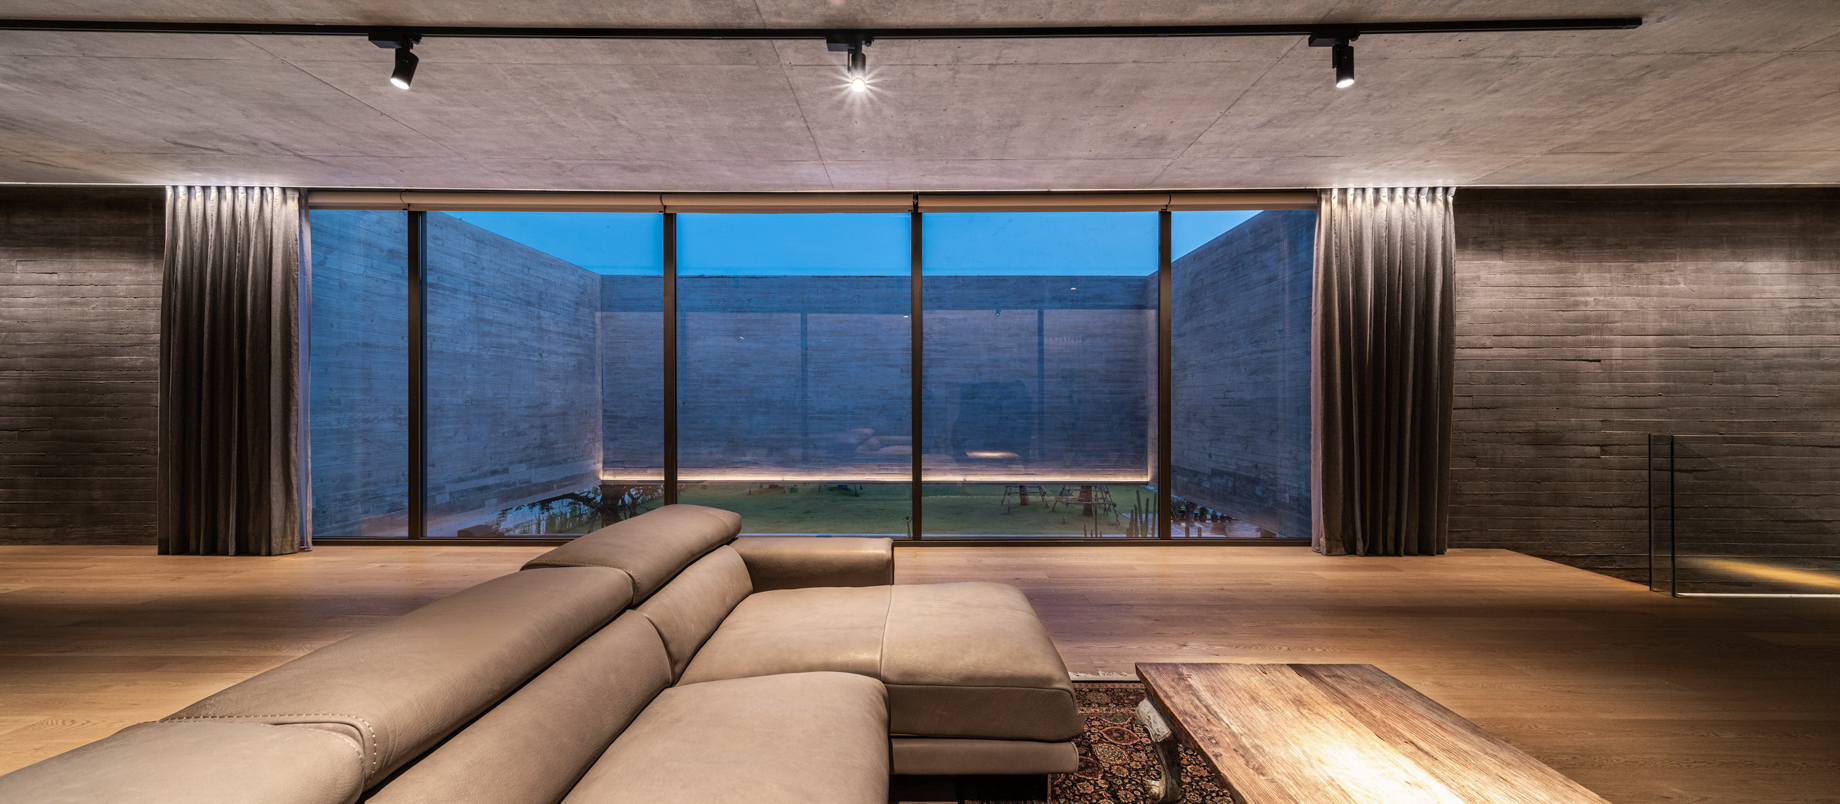 Casa de Alisa Luxury Residence – Nonthaburi, Thailand